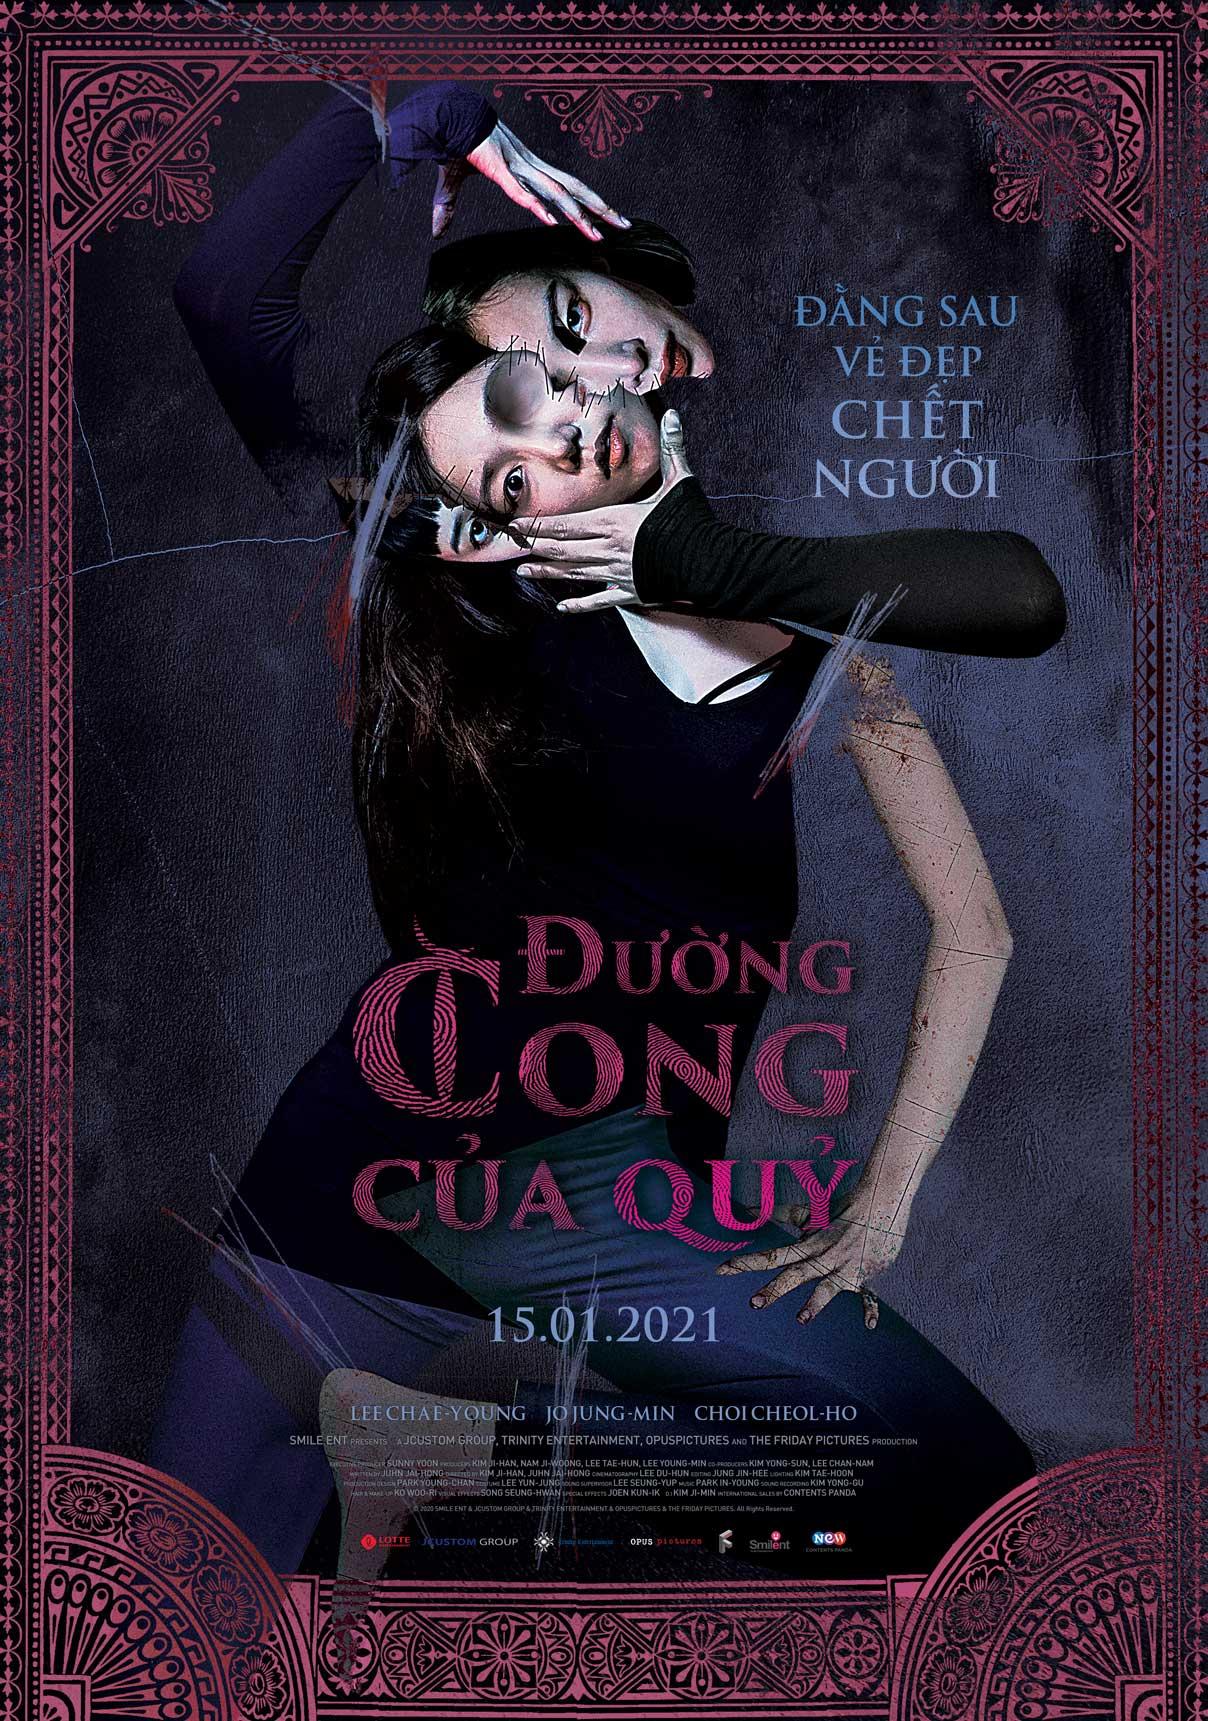 Poster phim The Cursed Lesson (Đường Cong Của Quỷ)